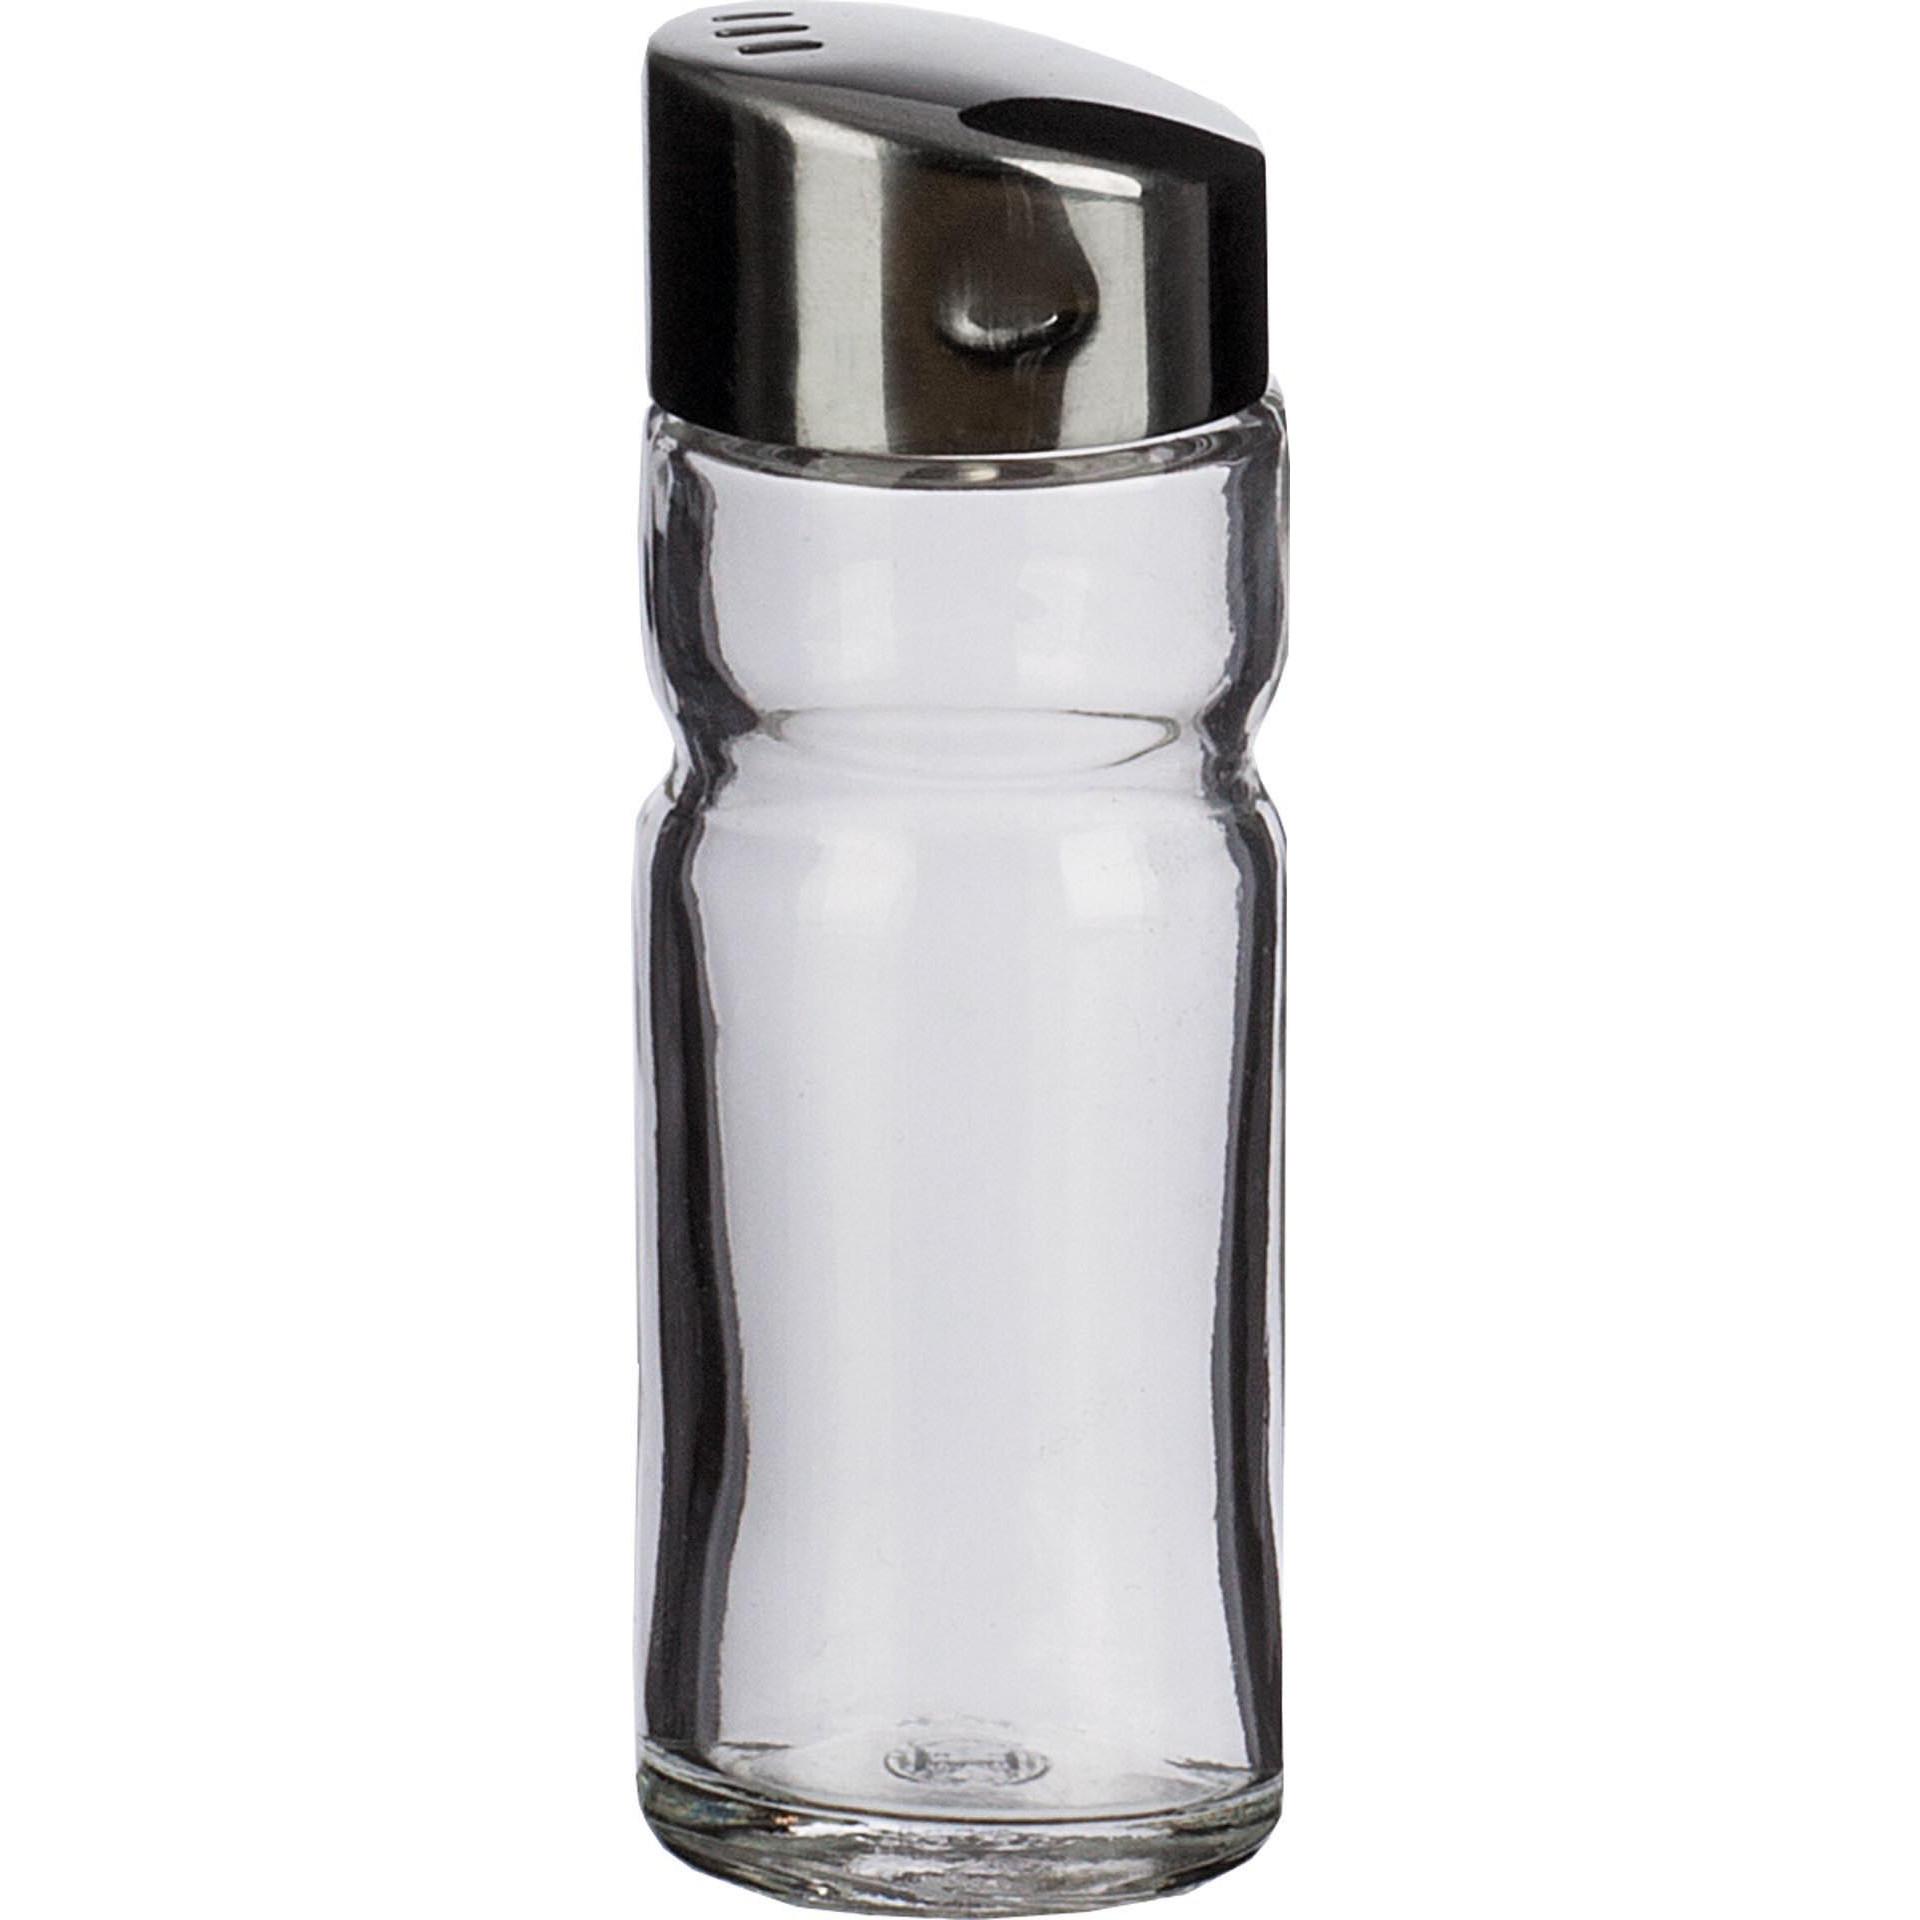 Ersatzstreuer Salz / Pfeffer